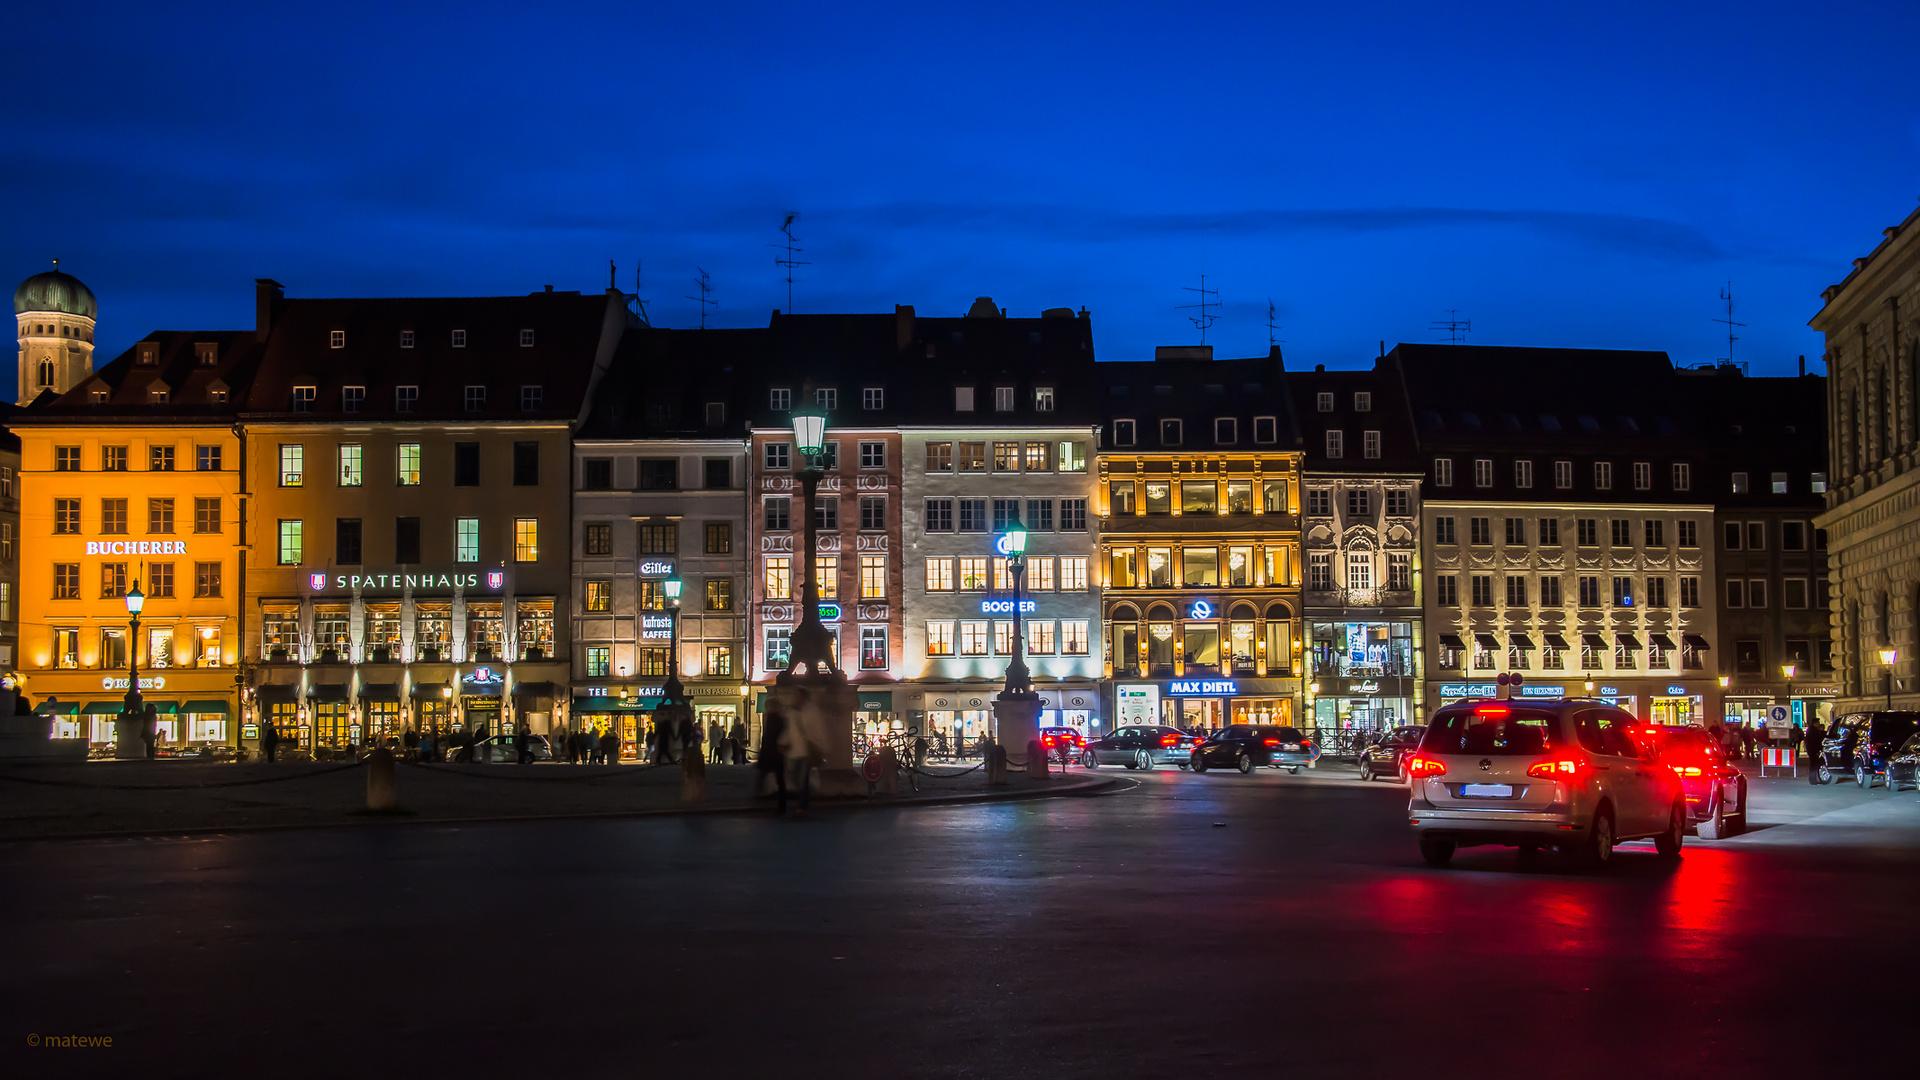 München - Nachtszene